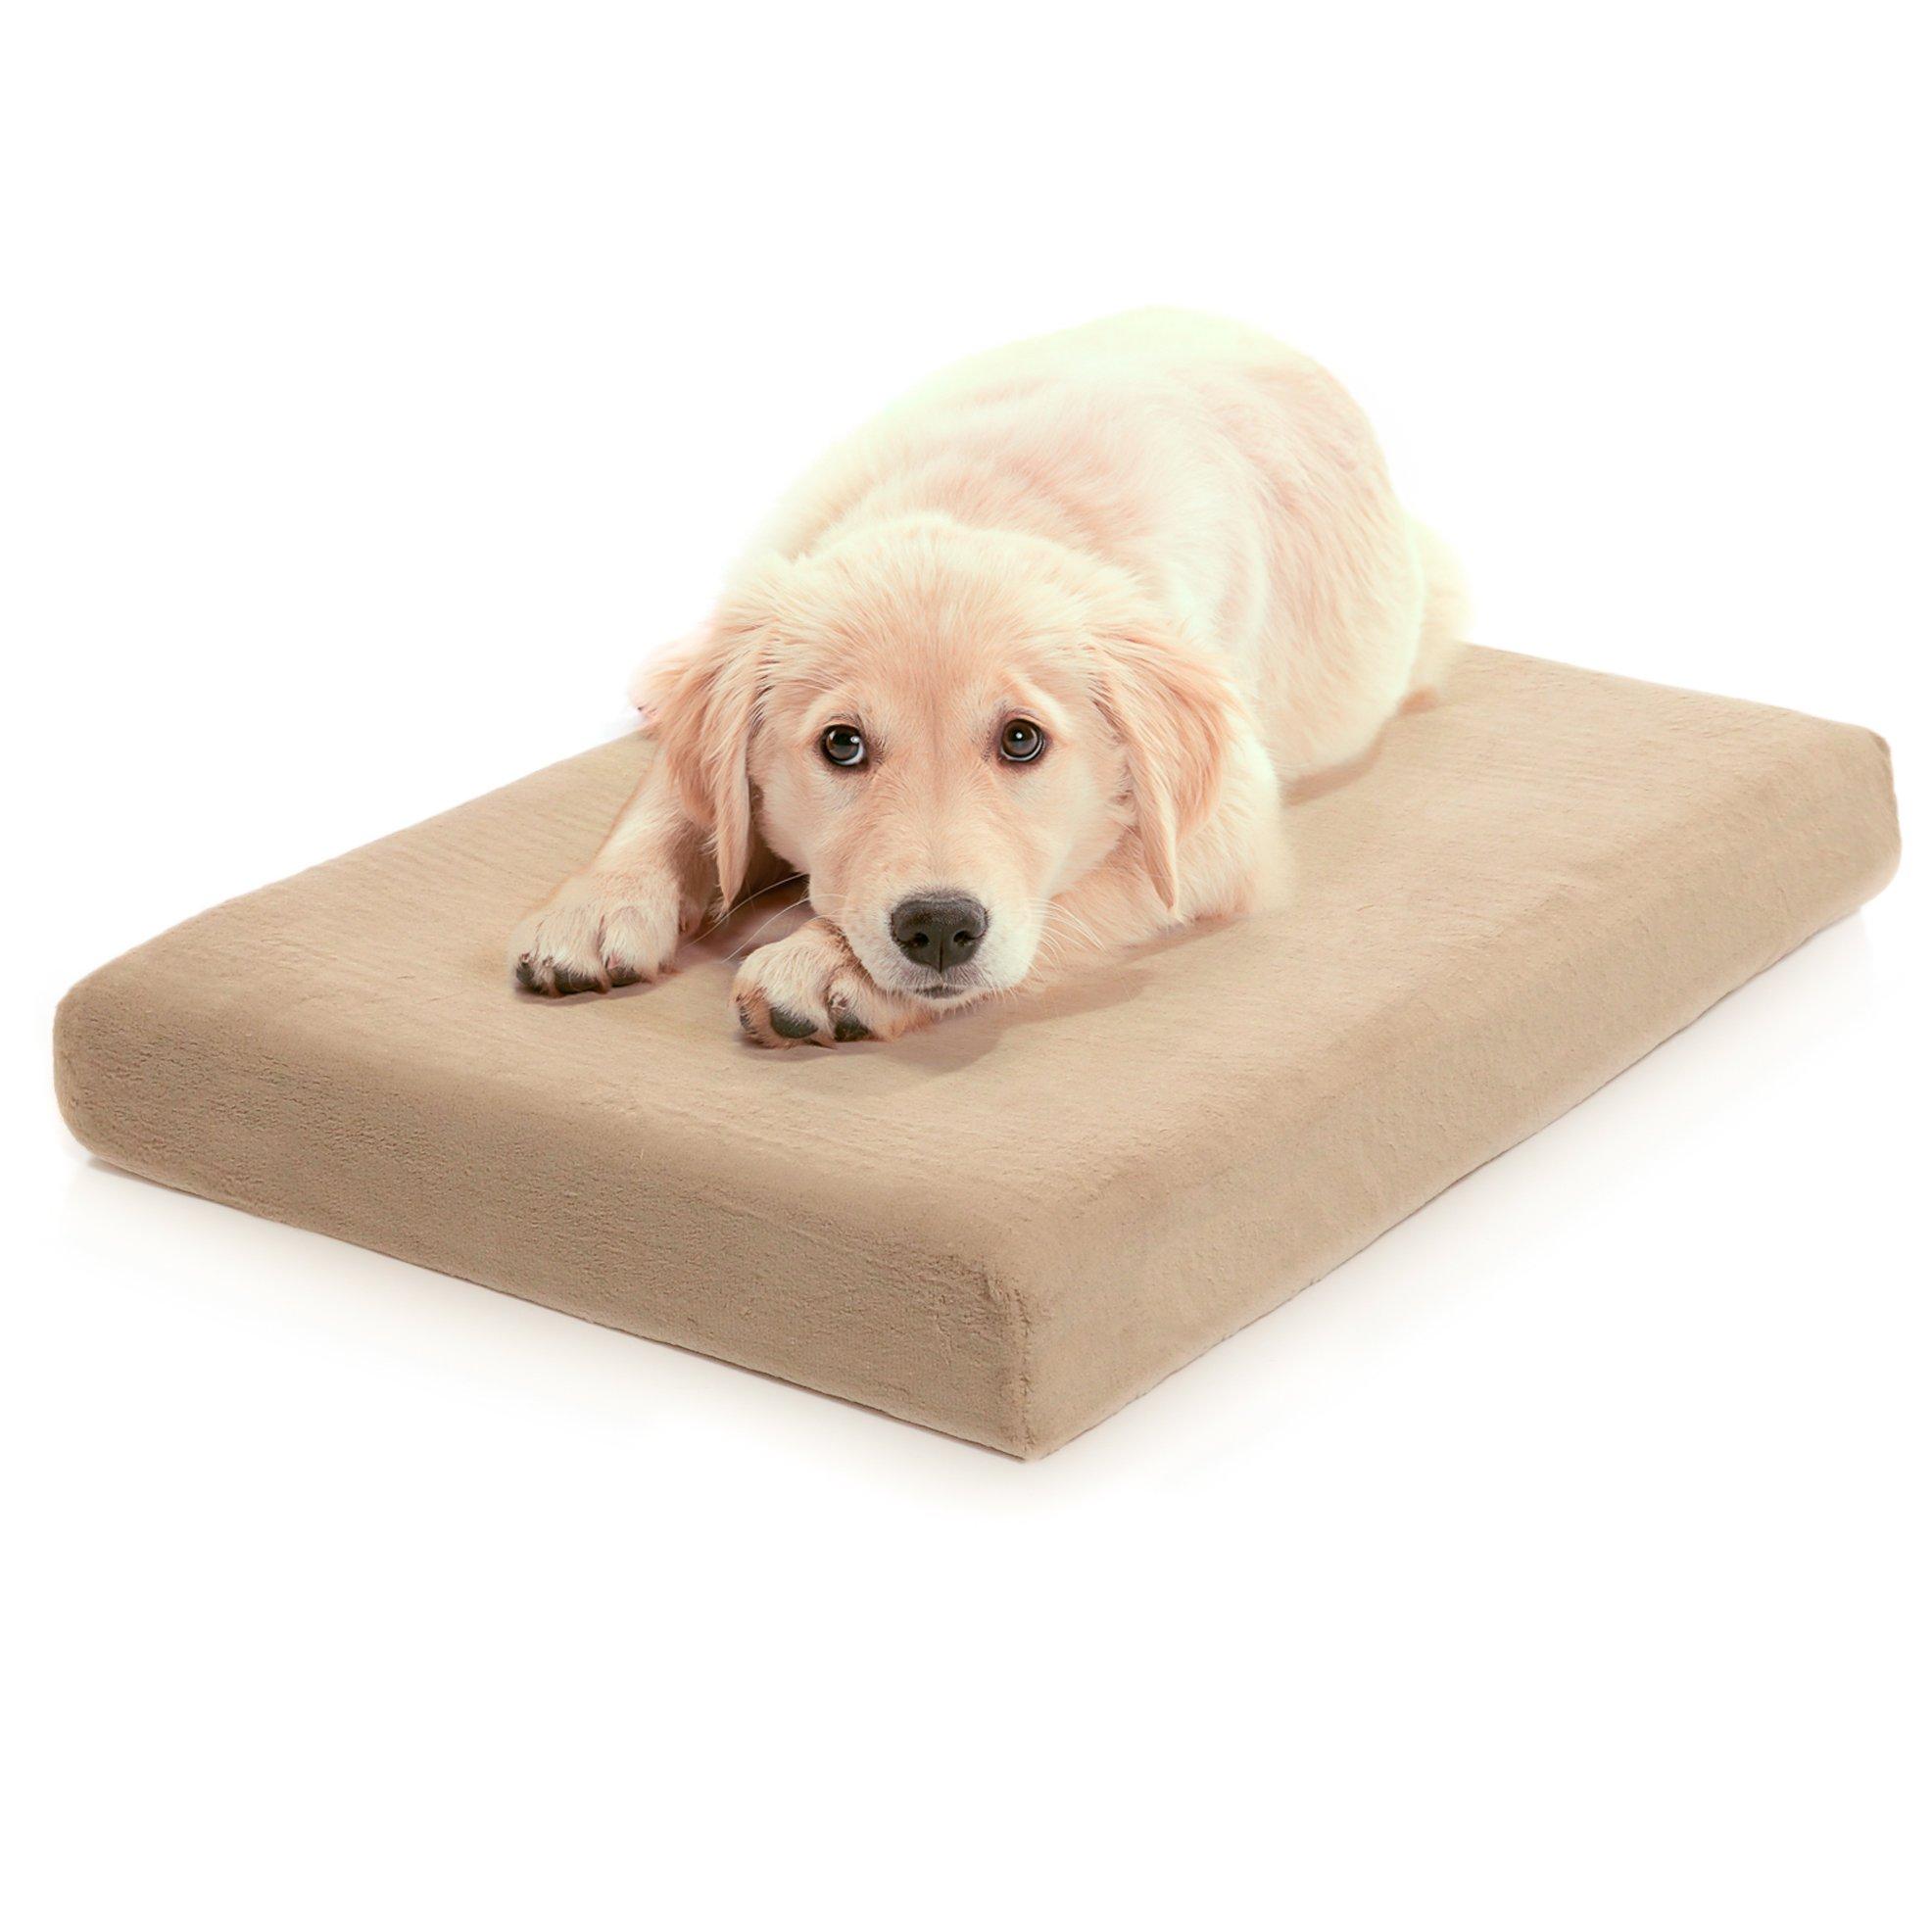 Milliard Premium Orthopedic Memory Foam Dog Bed with Anti-Microbial Waterproof Non-slip Cover, Medium 34x22x4 in by Milliard